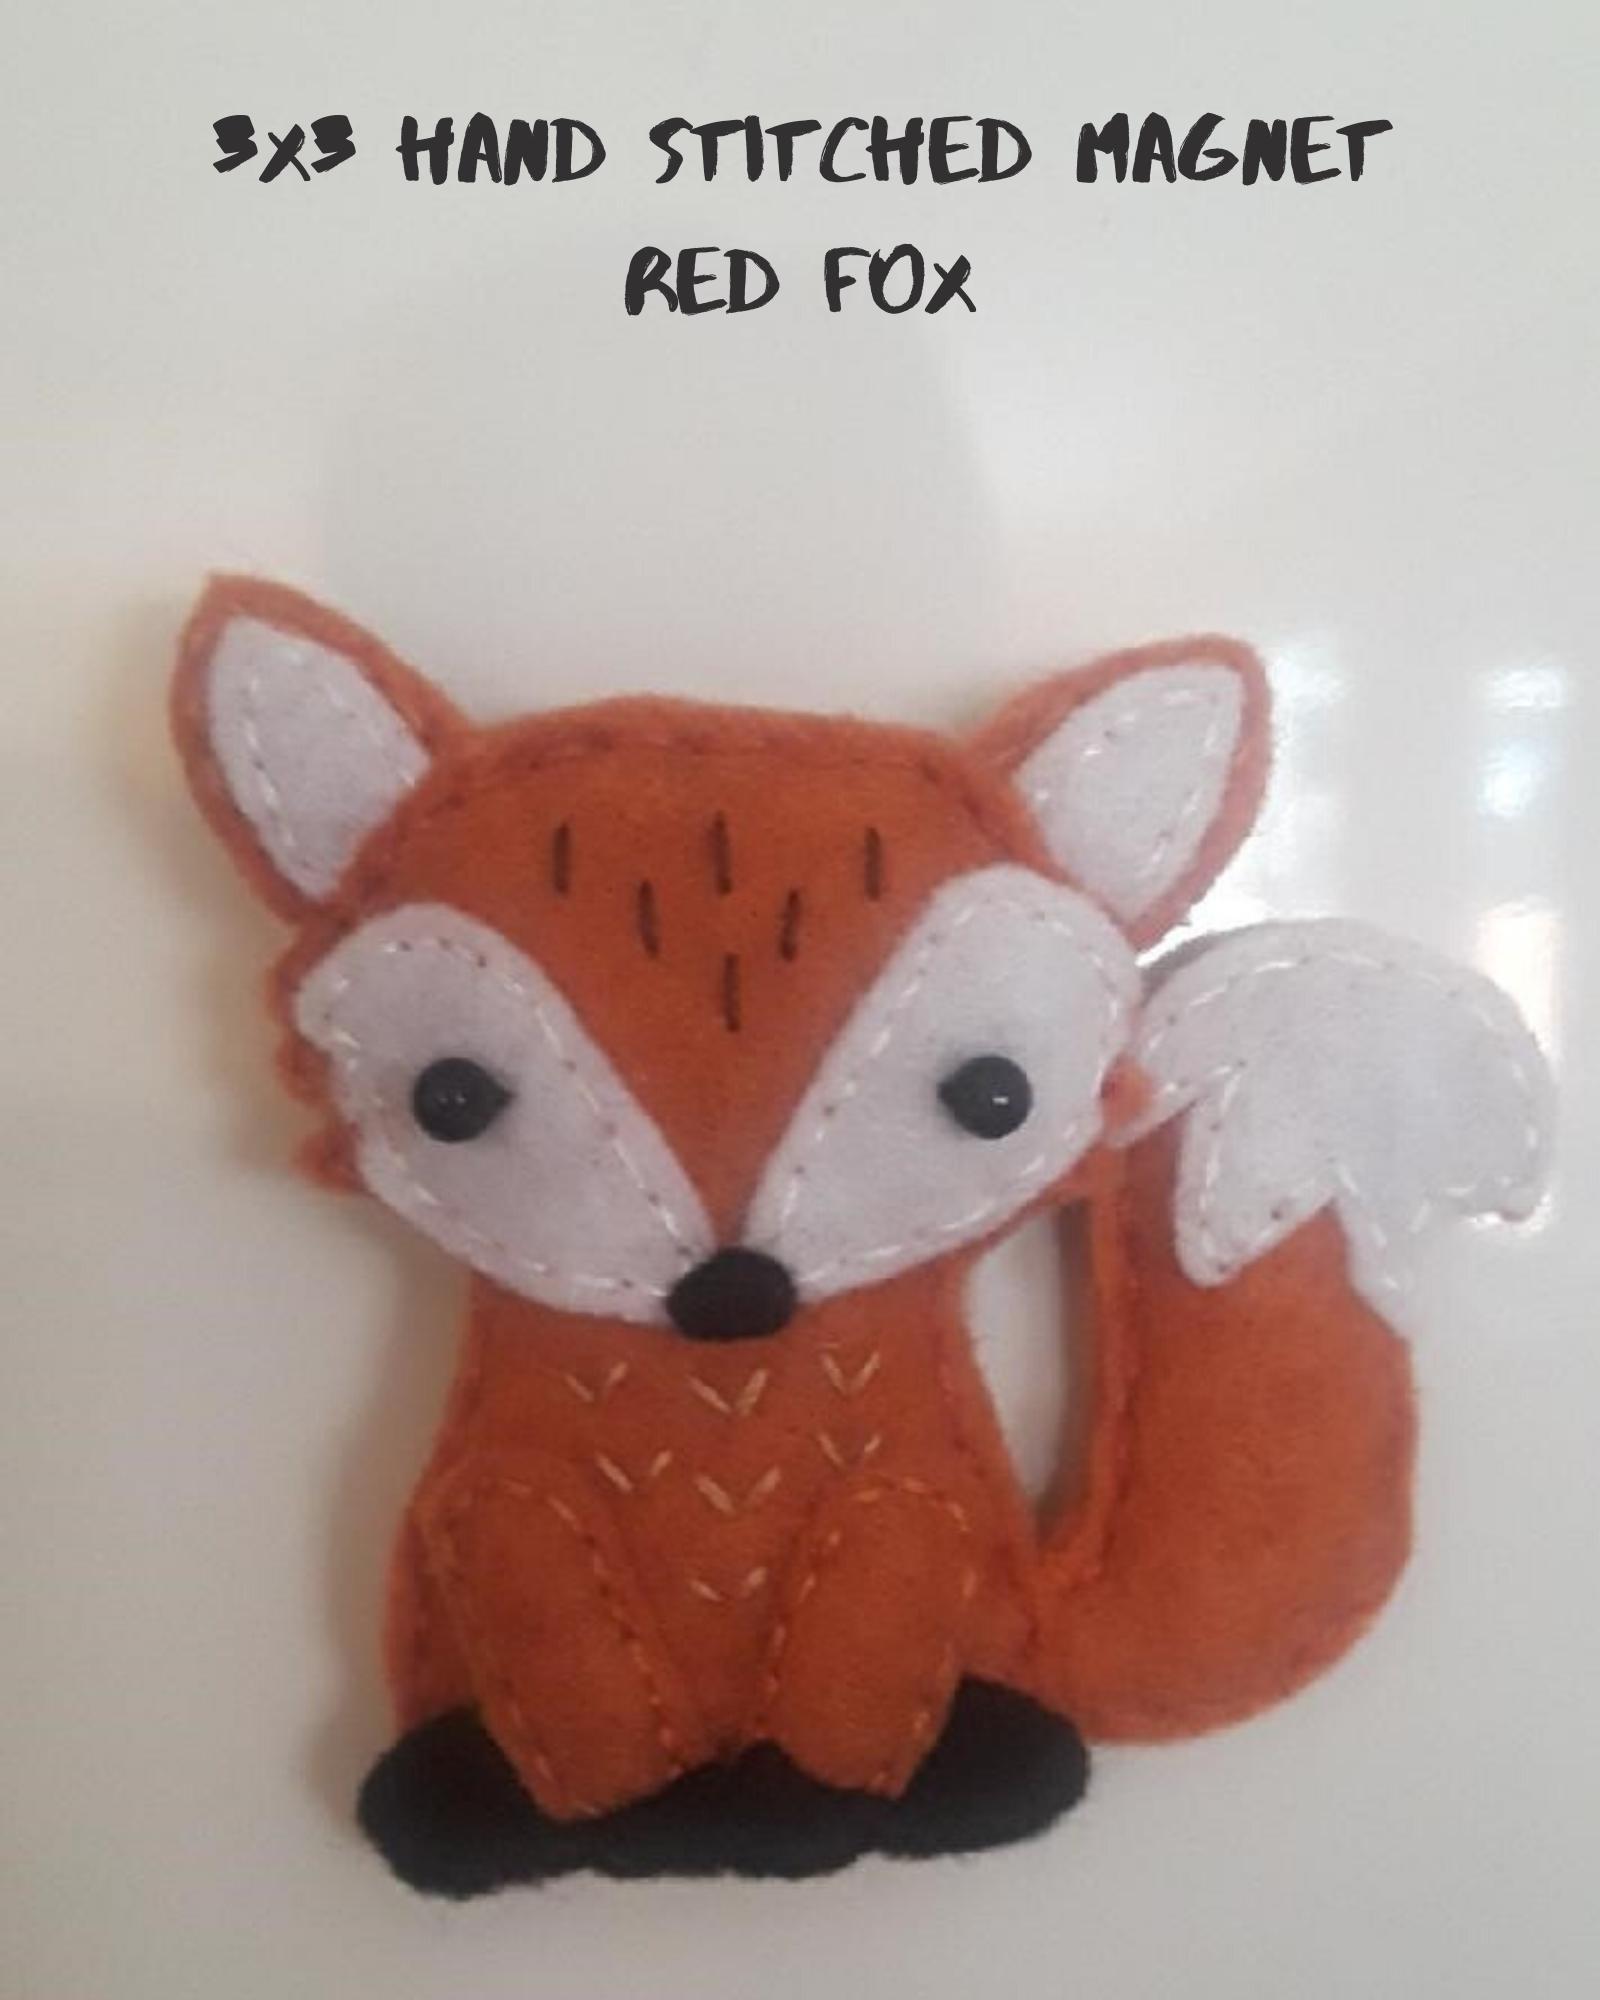 Red Fox Magnet